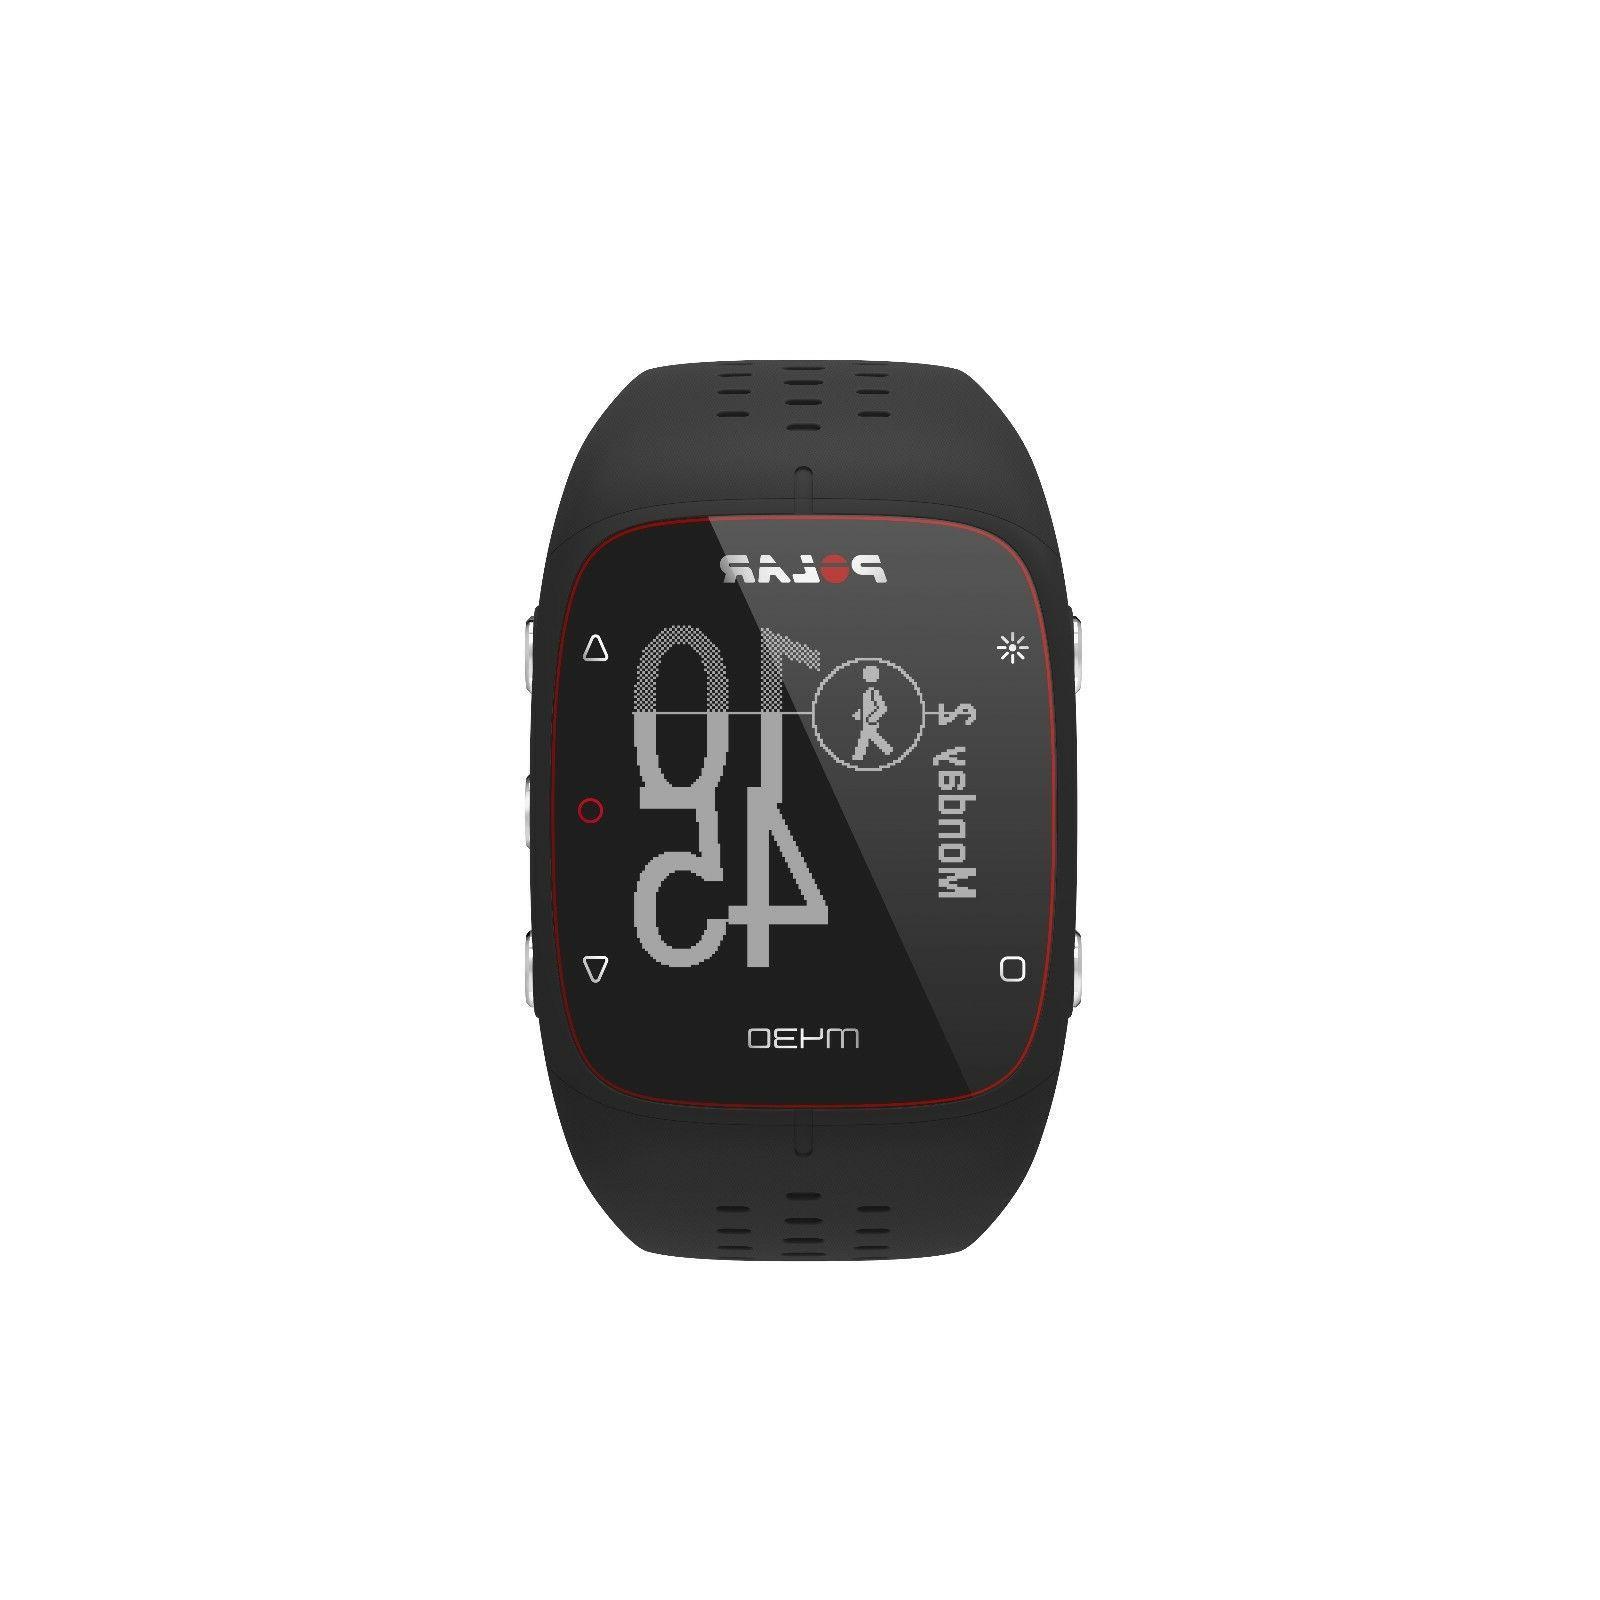 Polar running watch wrist-based rate